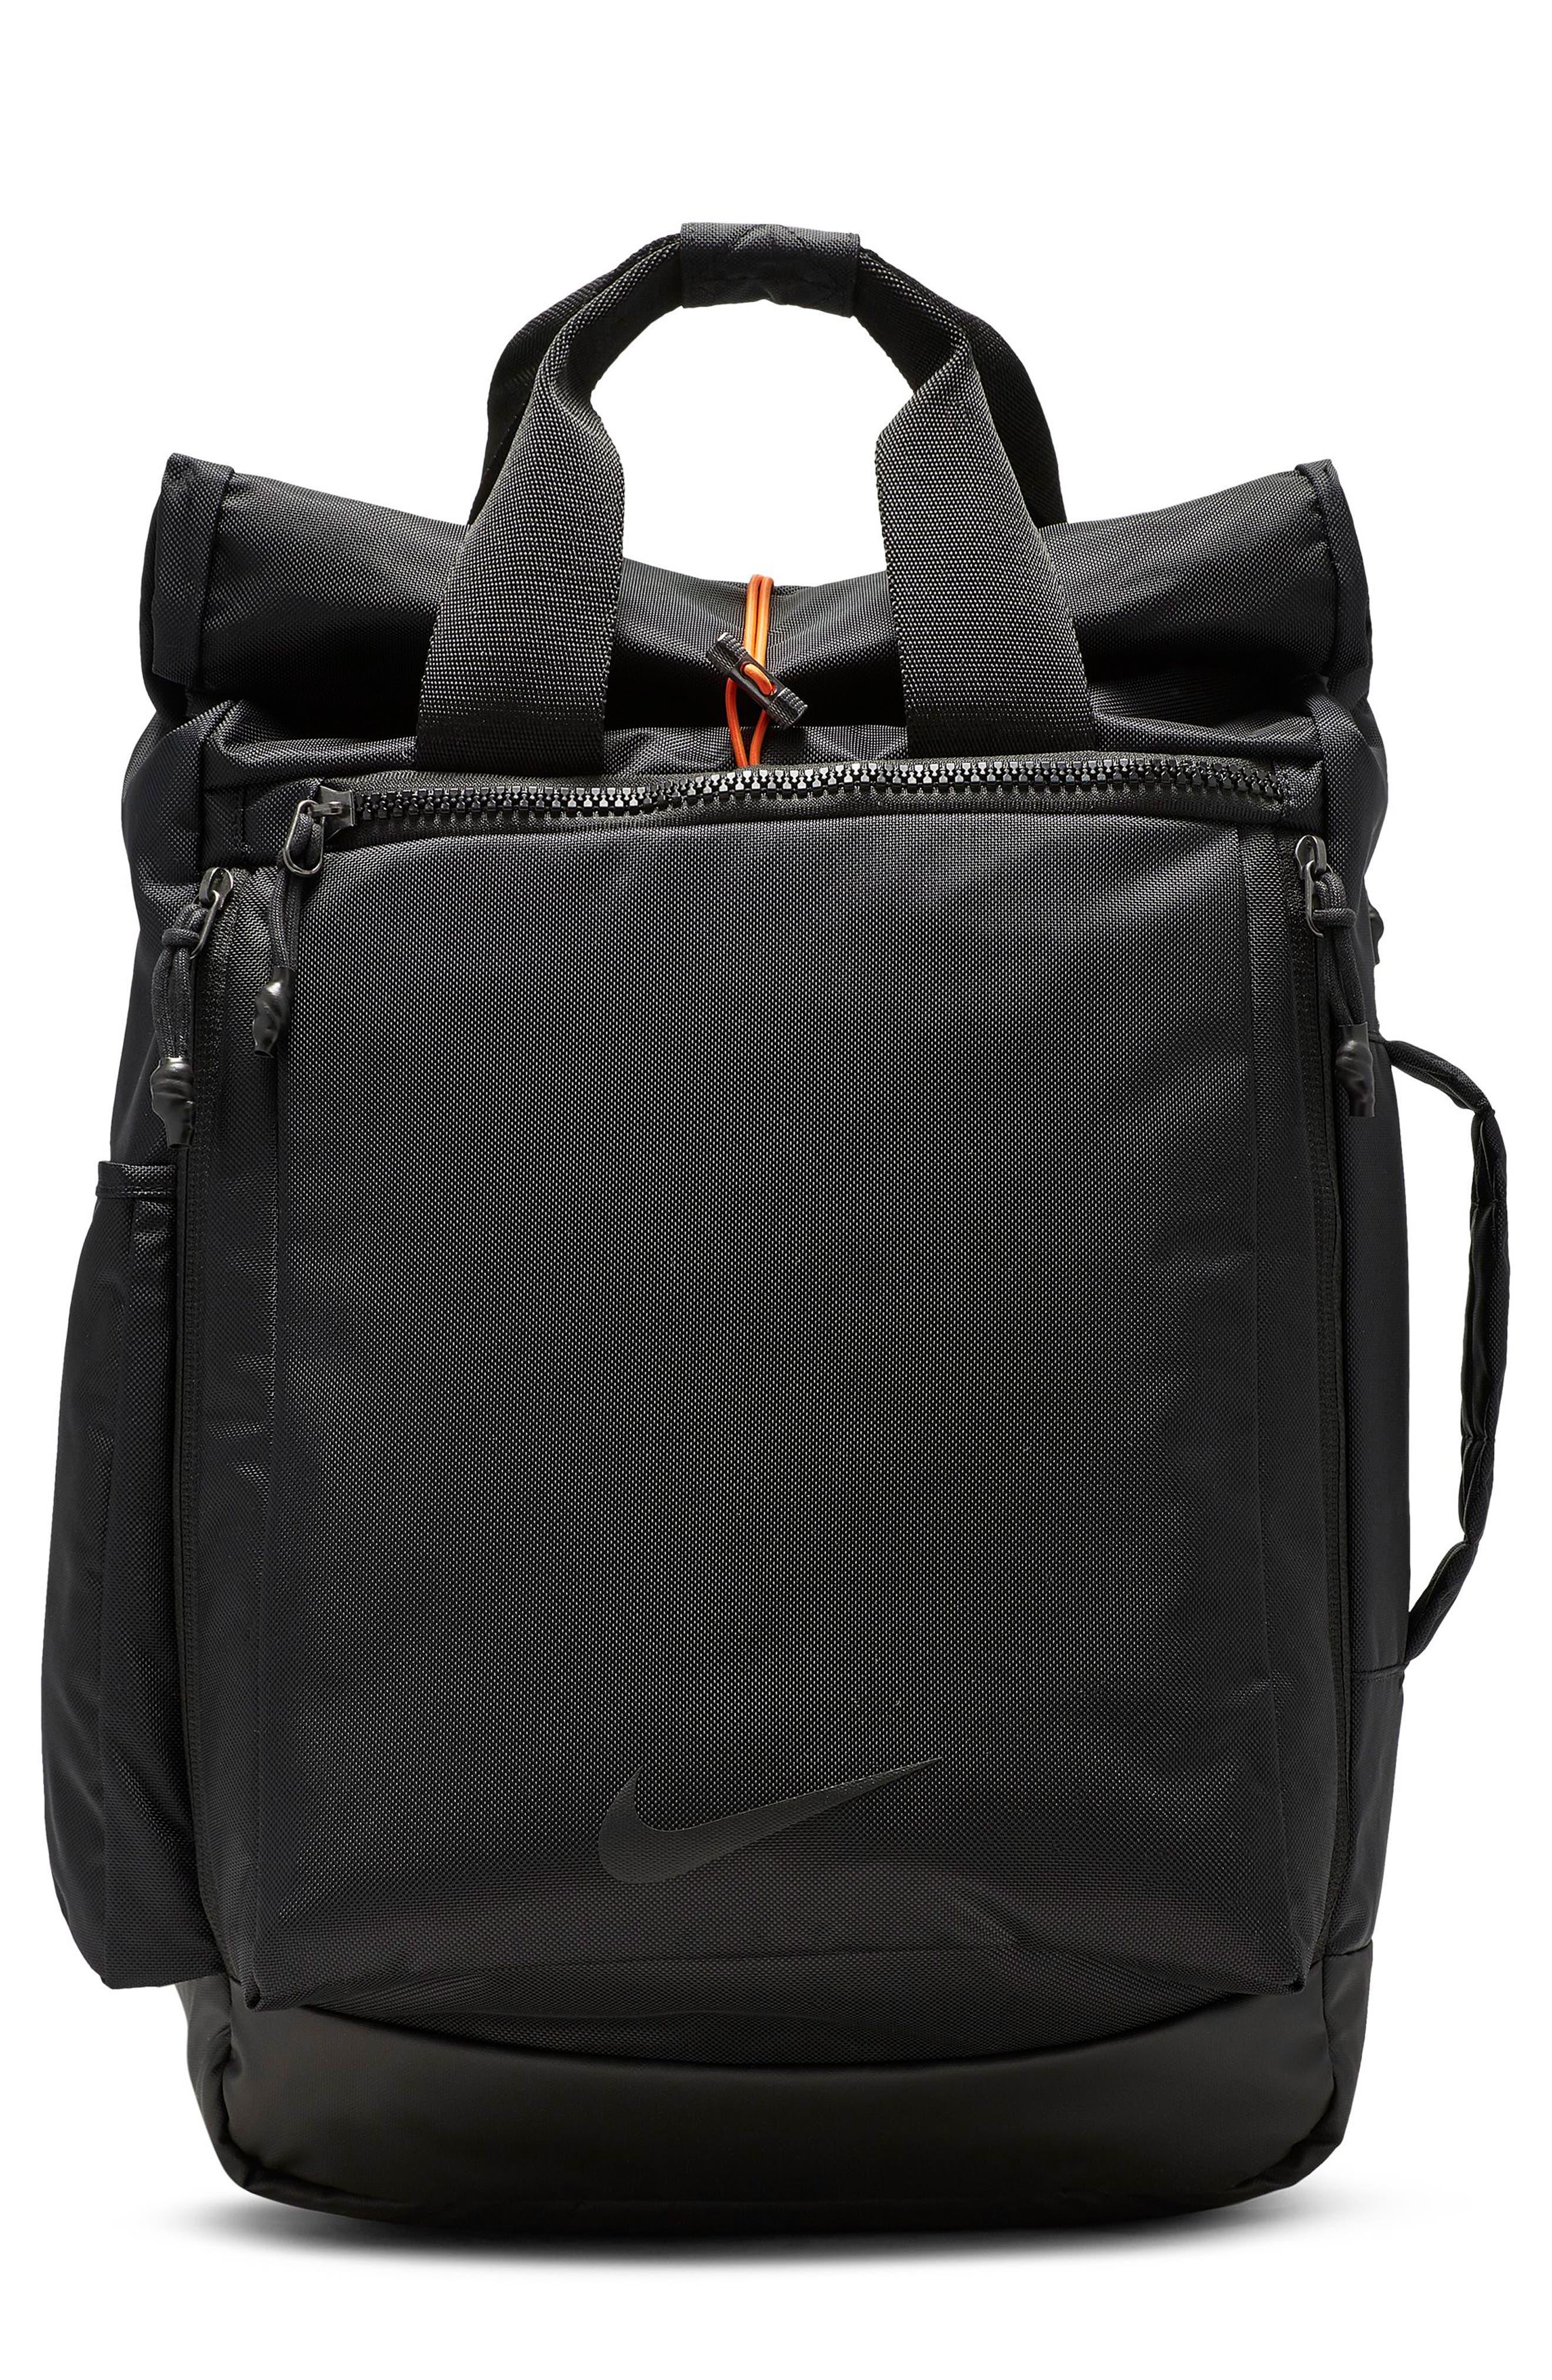 NIKE, Vapor Energy 2.0 Training Backpack, Main thumbnail 1, color, BLACK